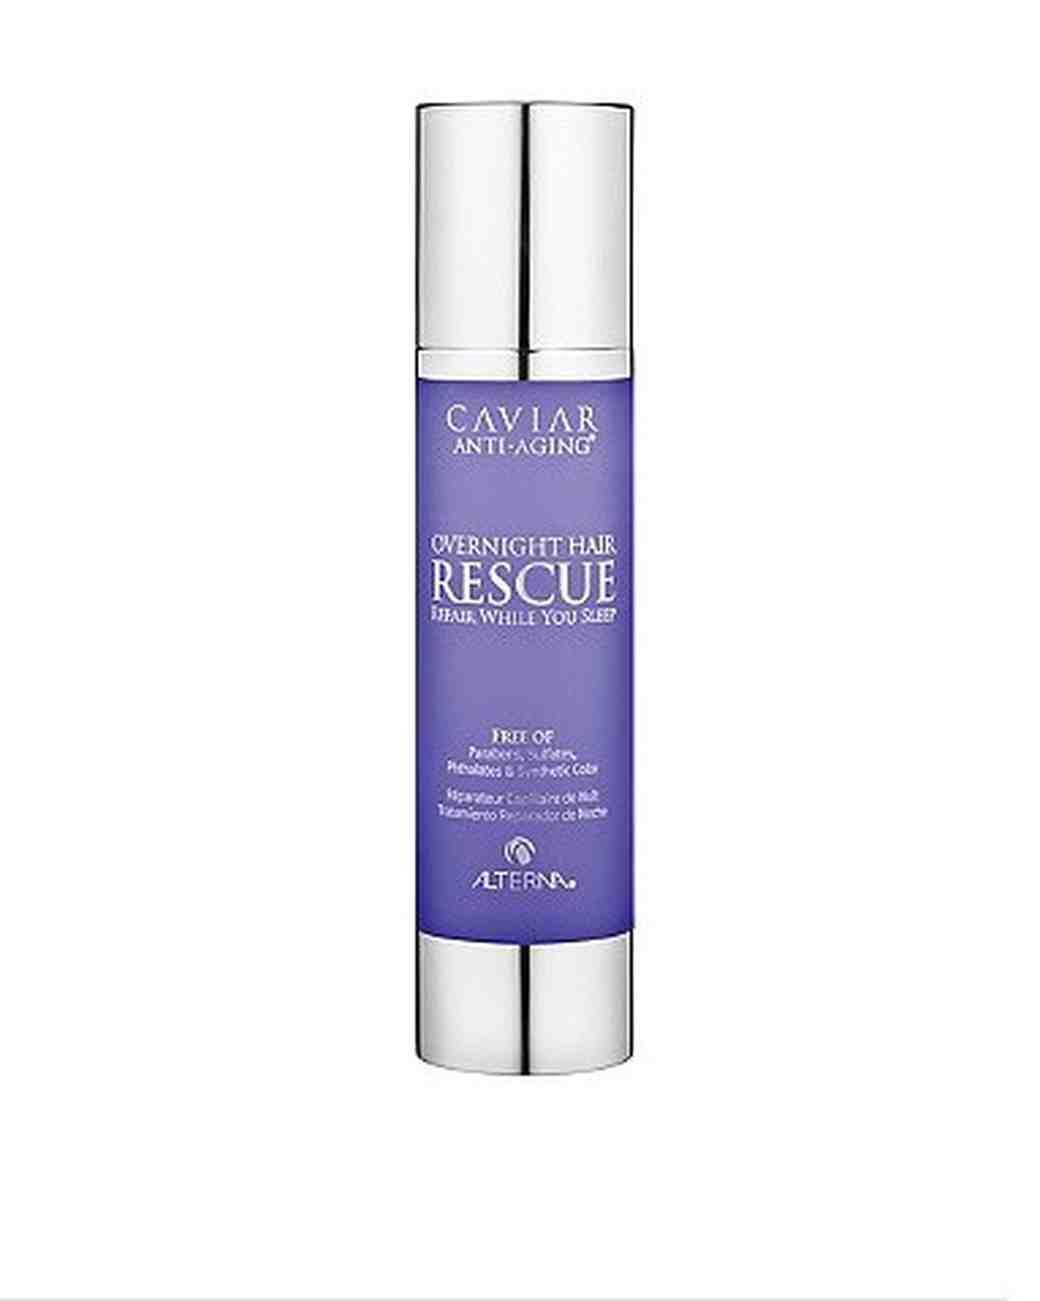 Alterna Anti-Aging Hair Rescue